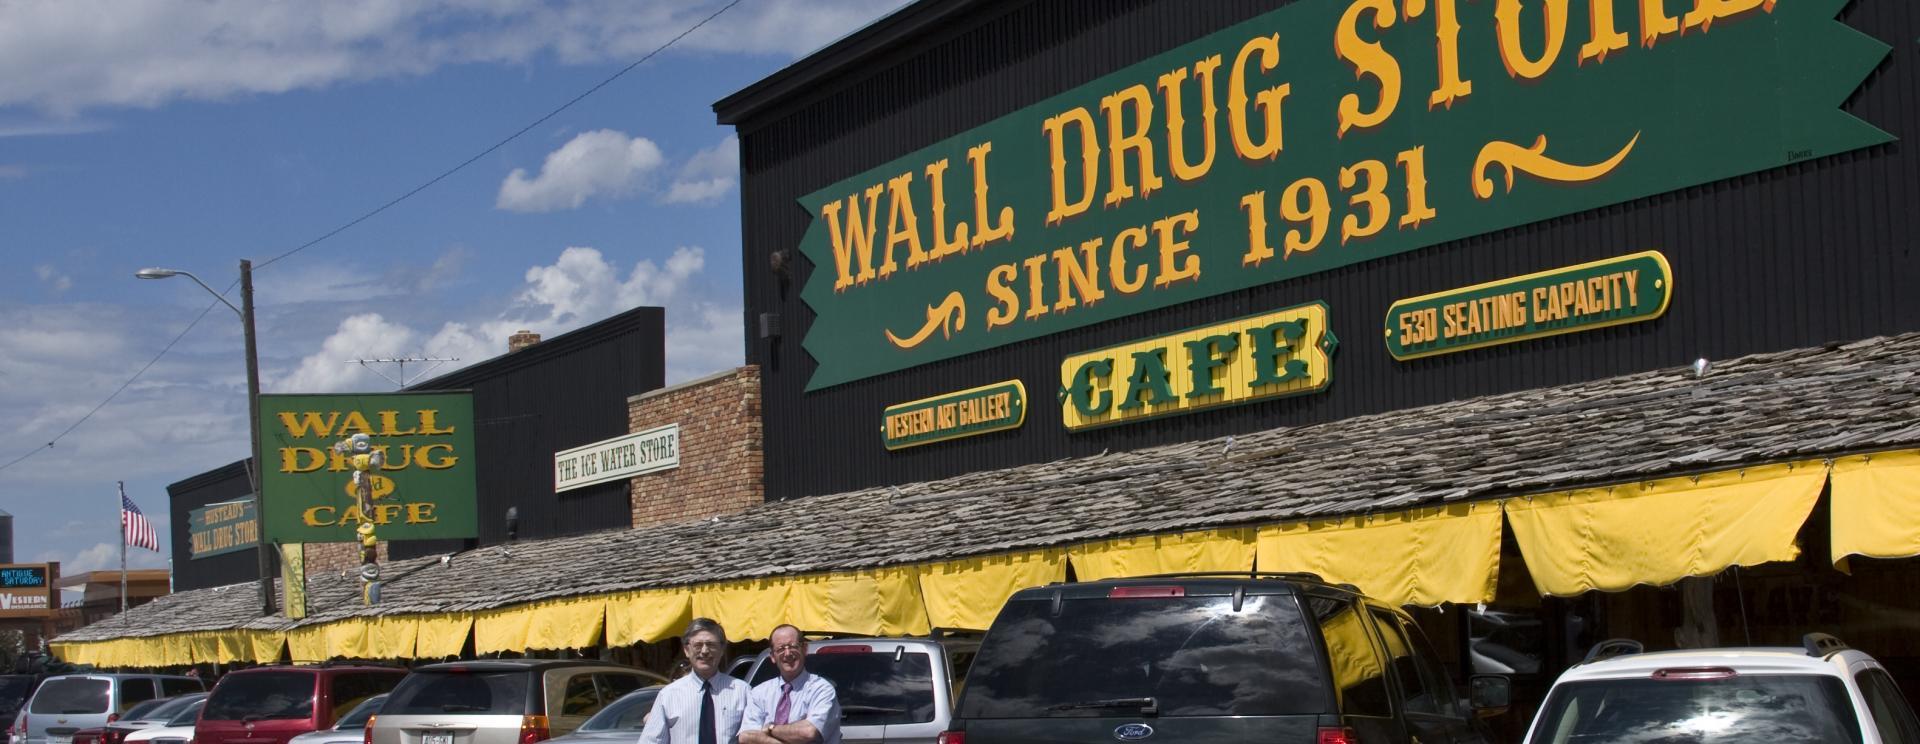 Wall Drug Store Restaurant